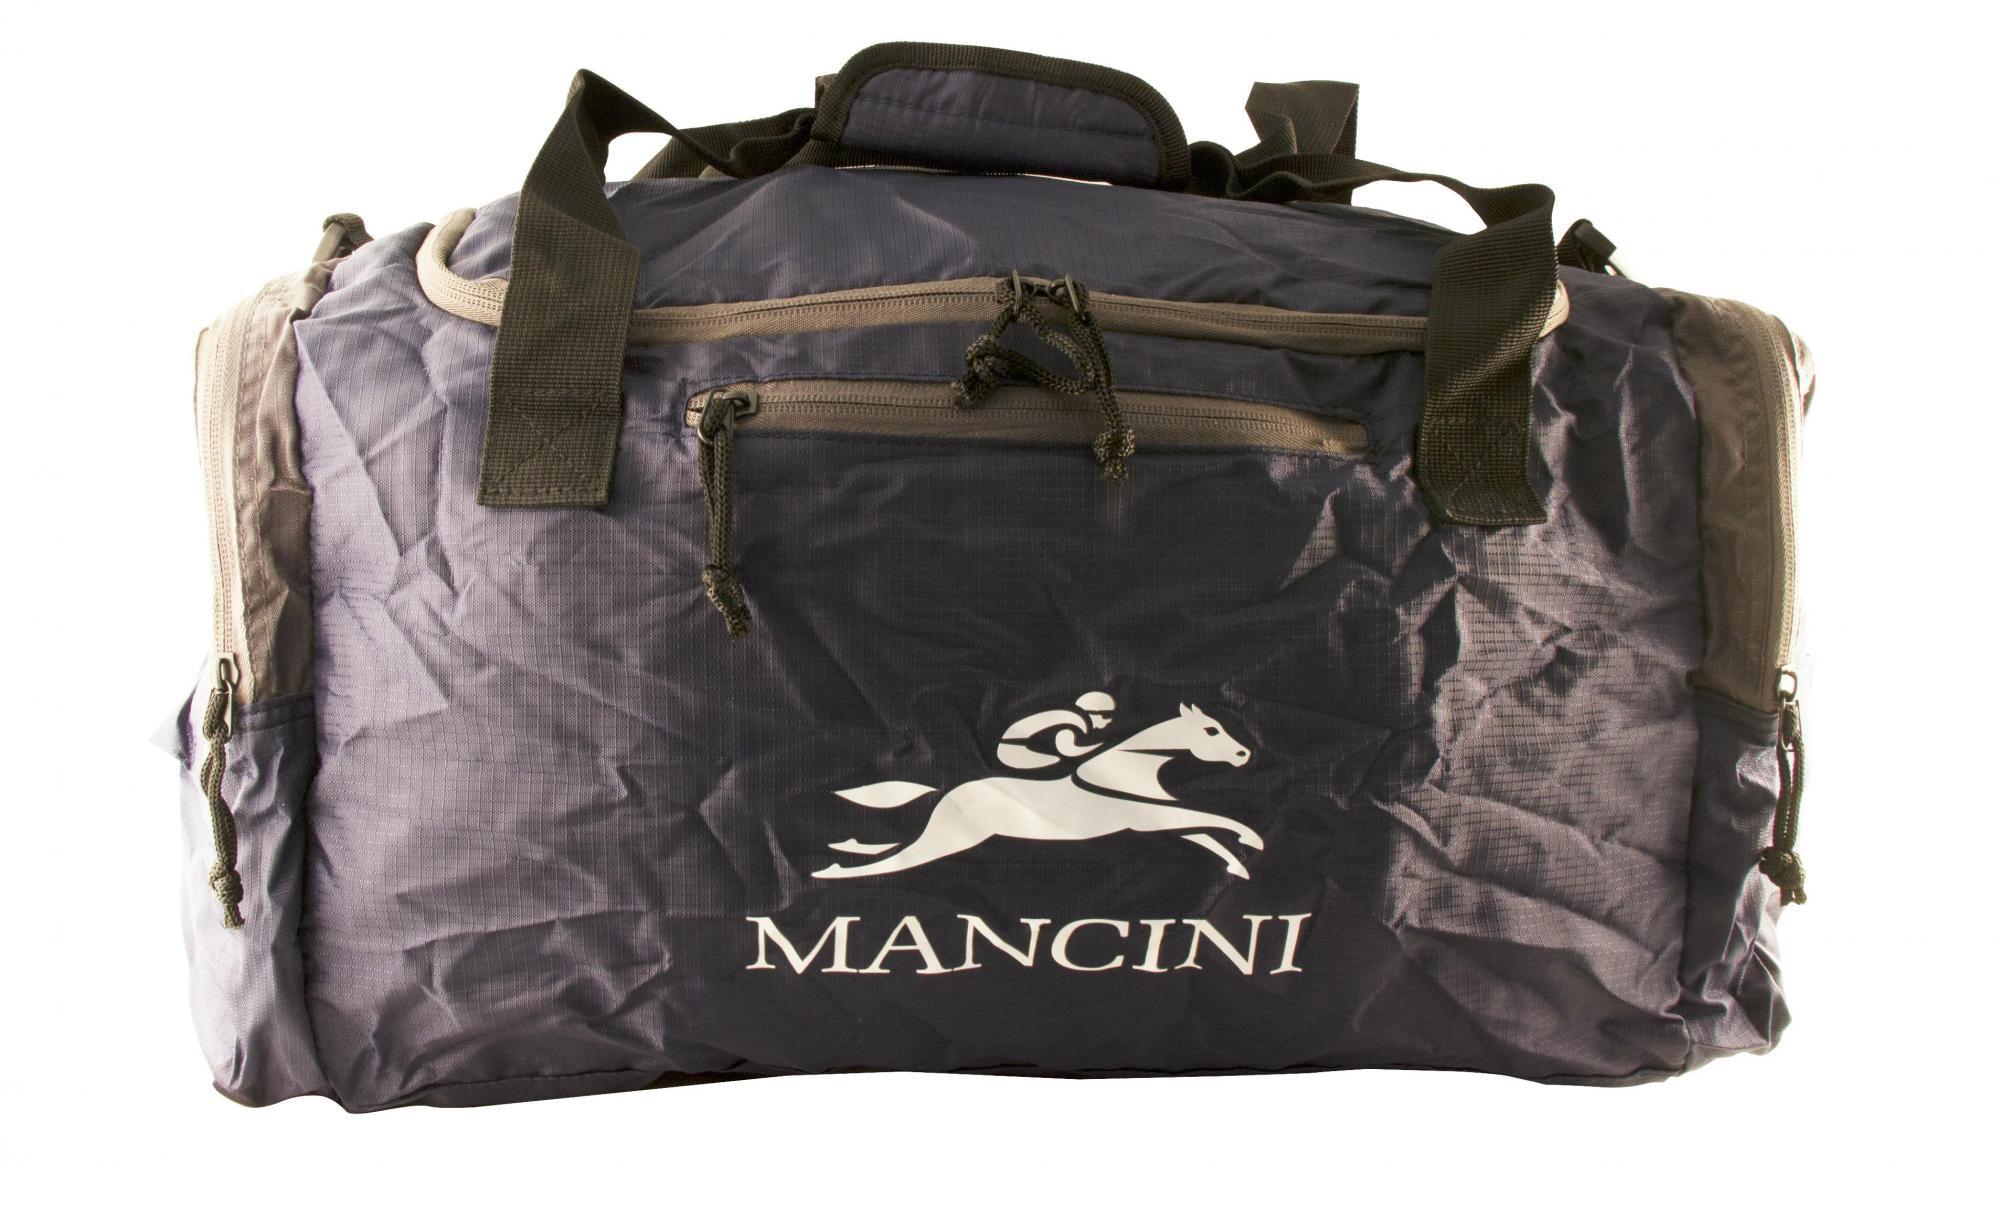 Mancini Pack'Em In Travel Packable Duffle Bag by Mancini